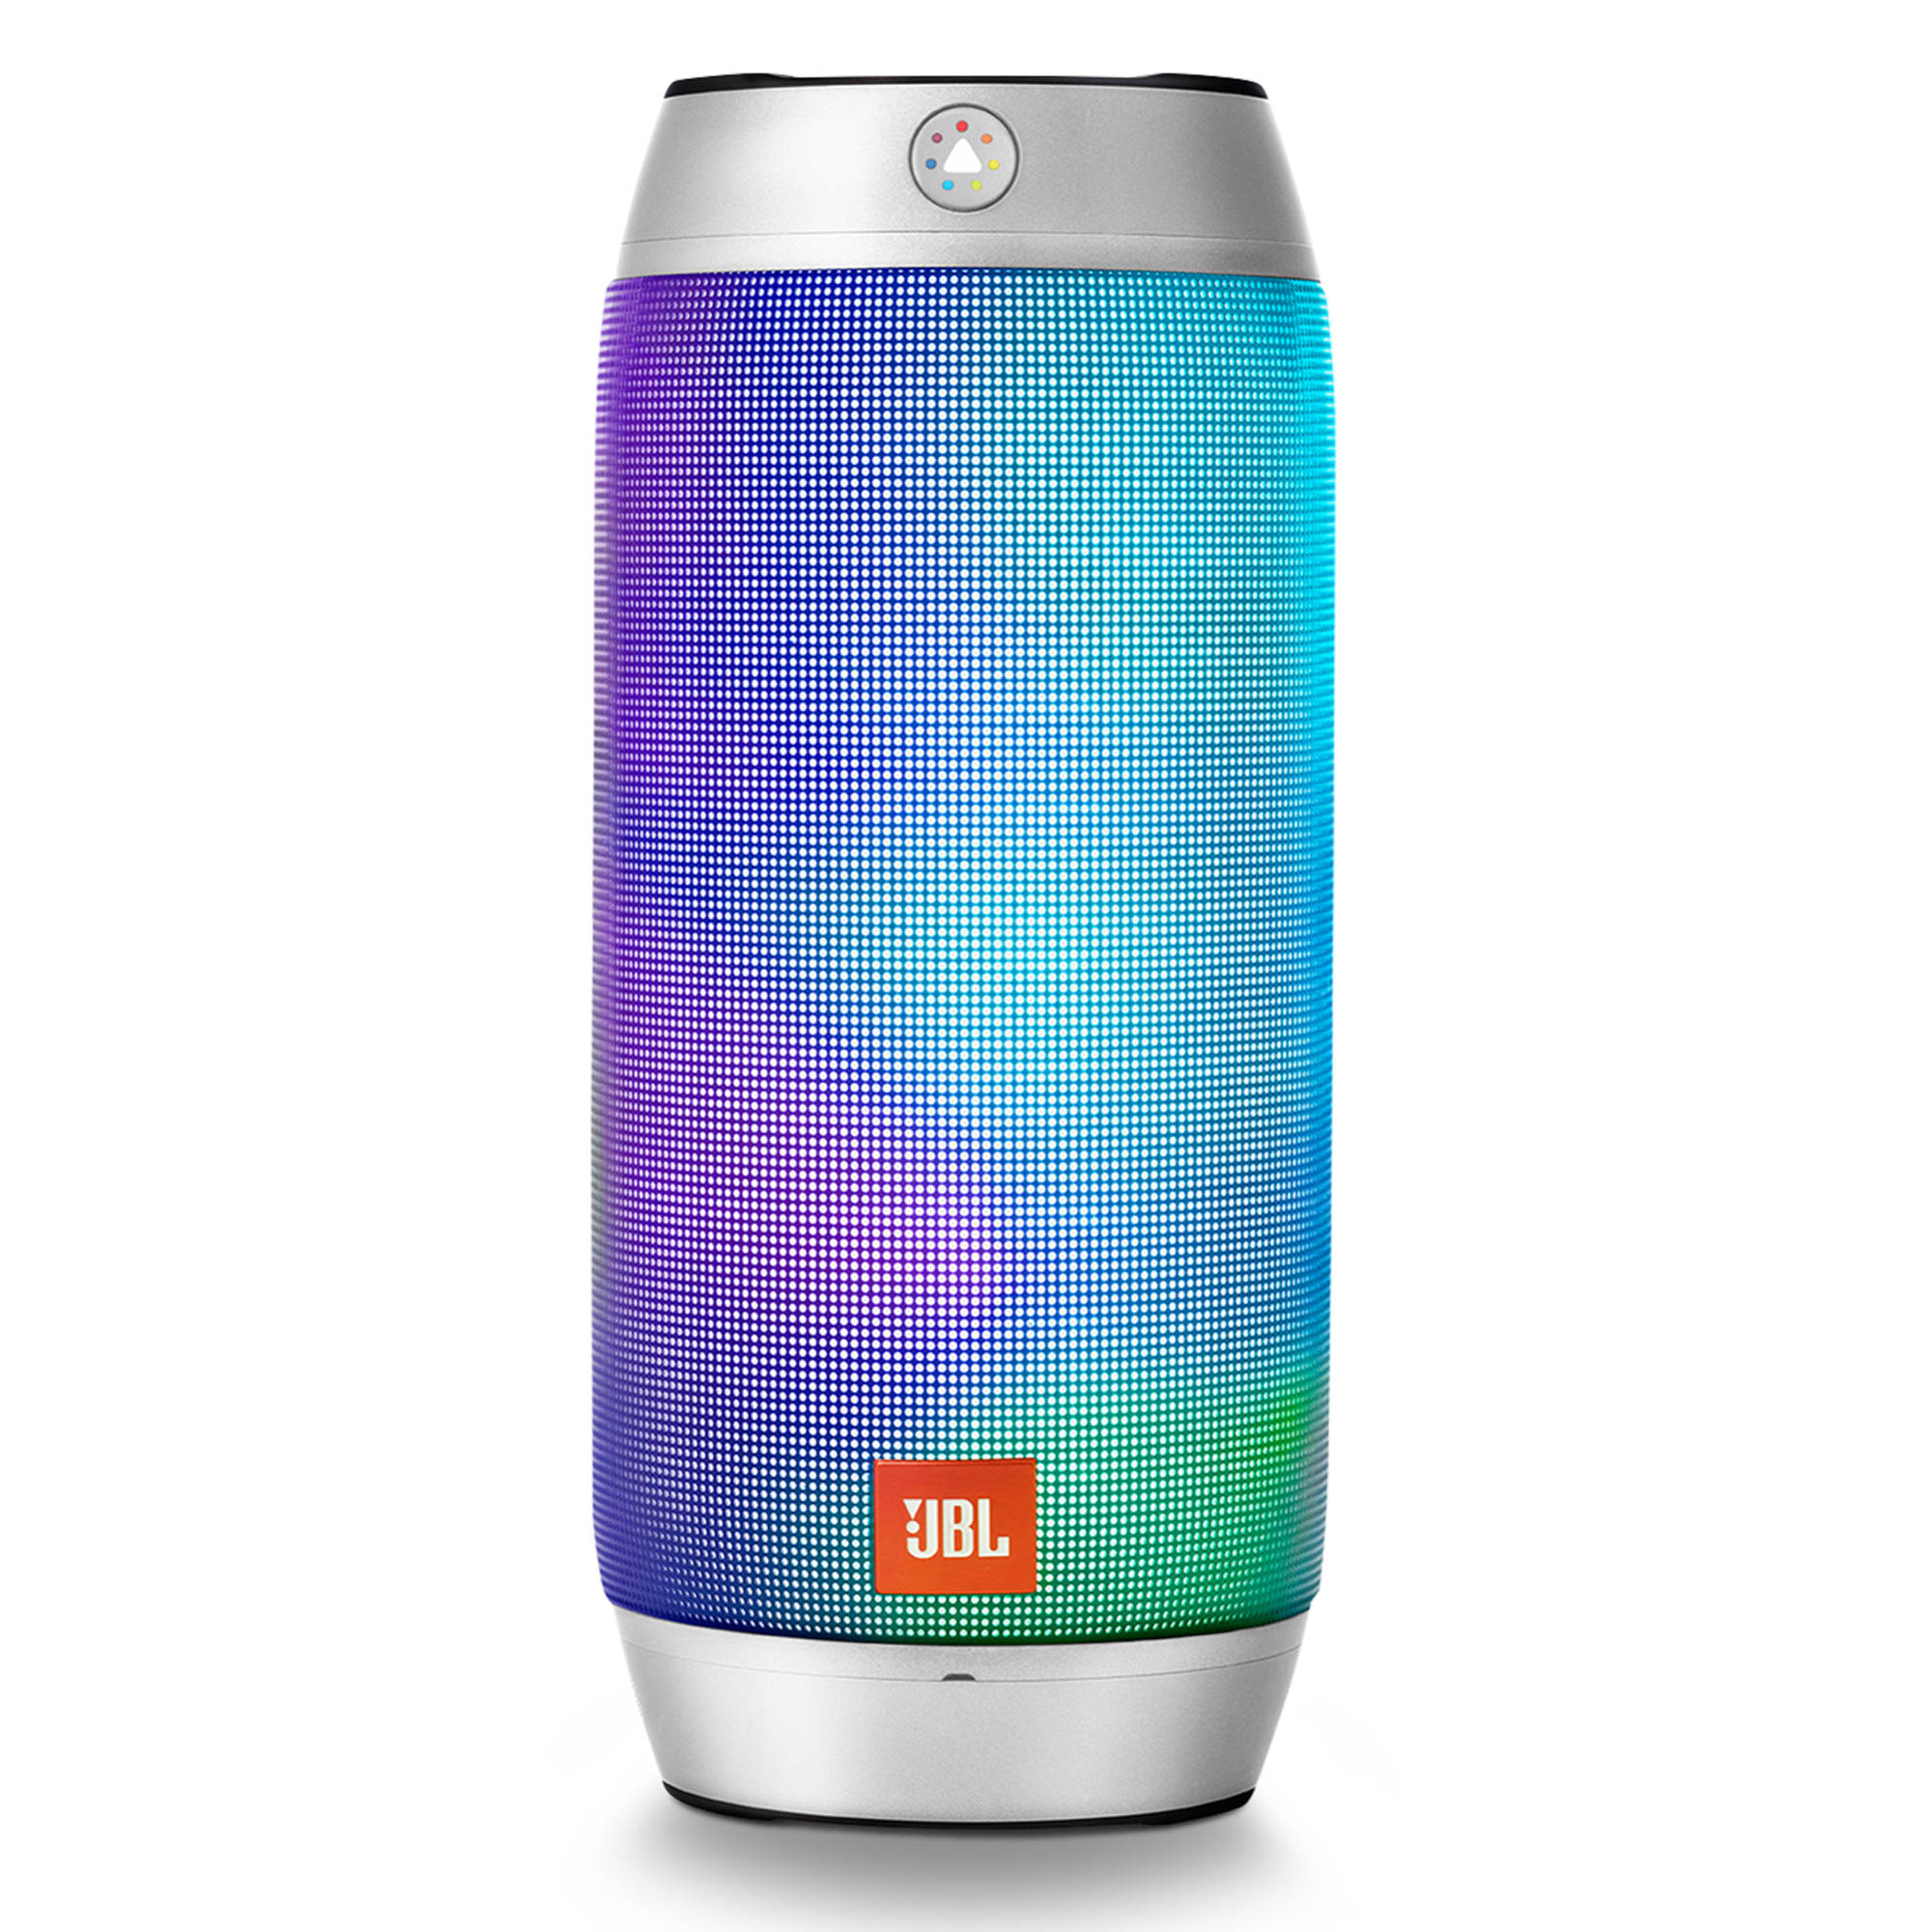 Jbl Pulse 2 Splashproof Portable Bl End 2 15 2019 12 15 Am